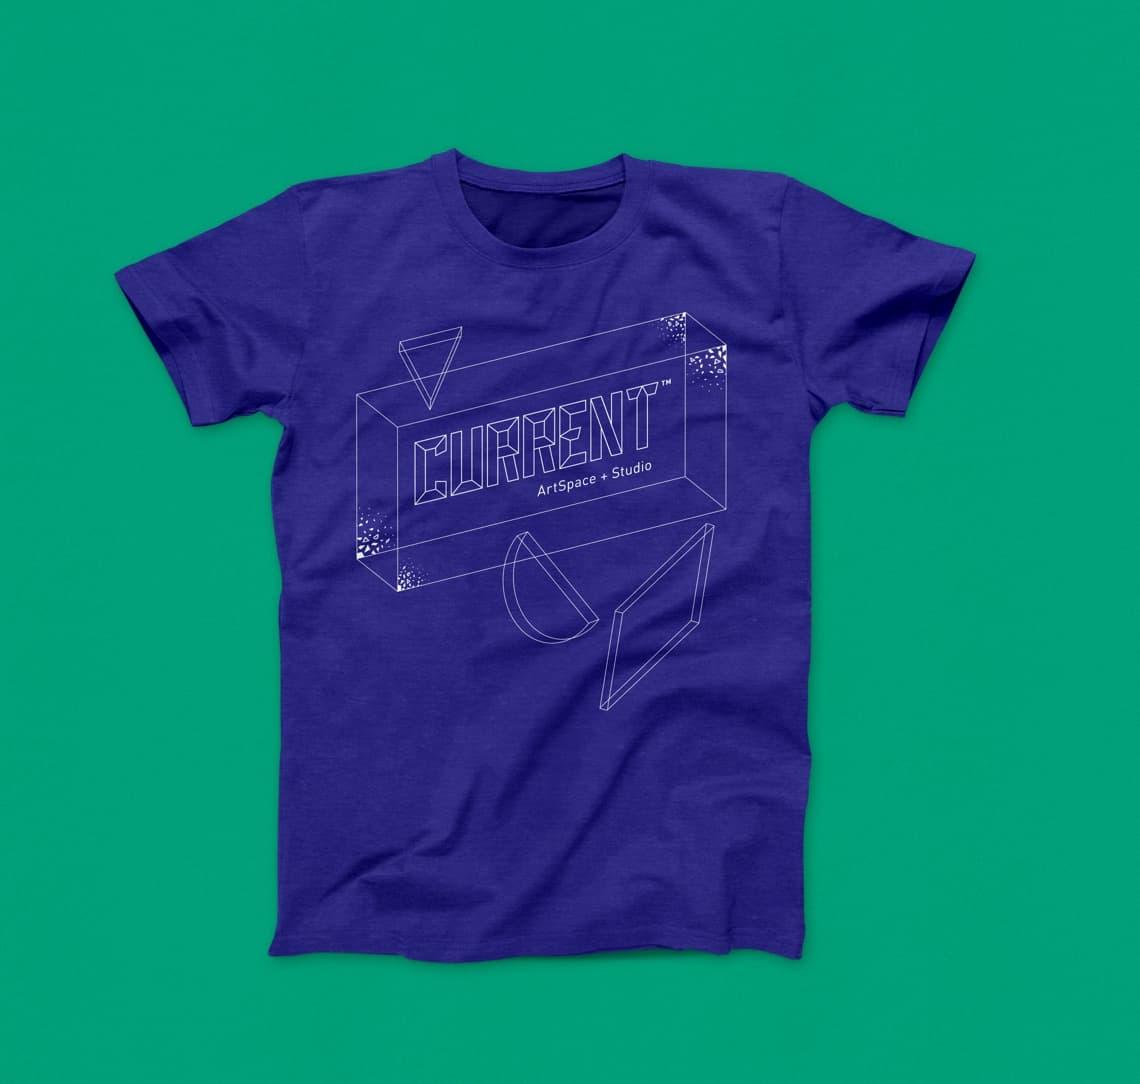 Current t-shirt